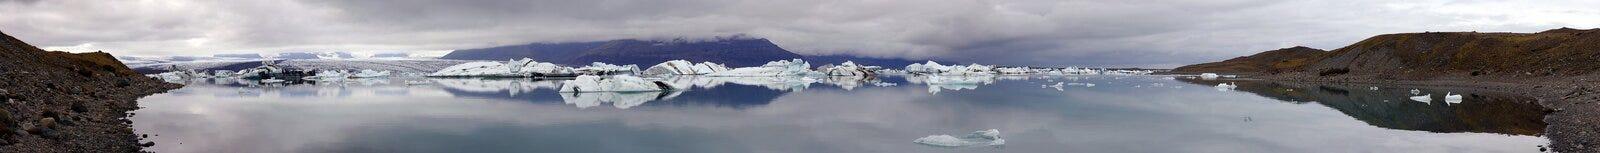 Glacier Lake Panorama royalty free stock photos